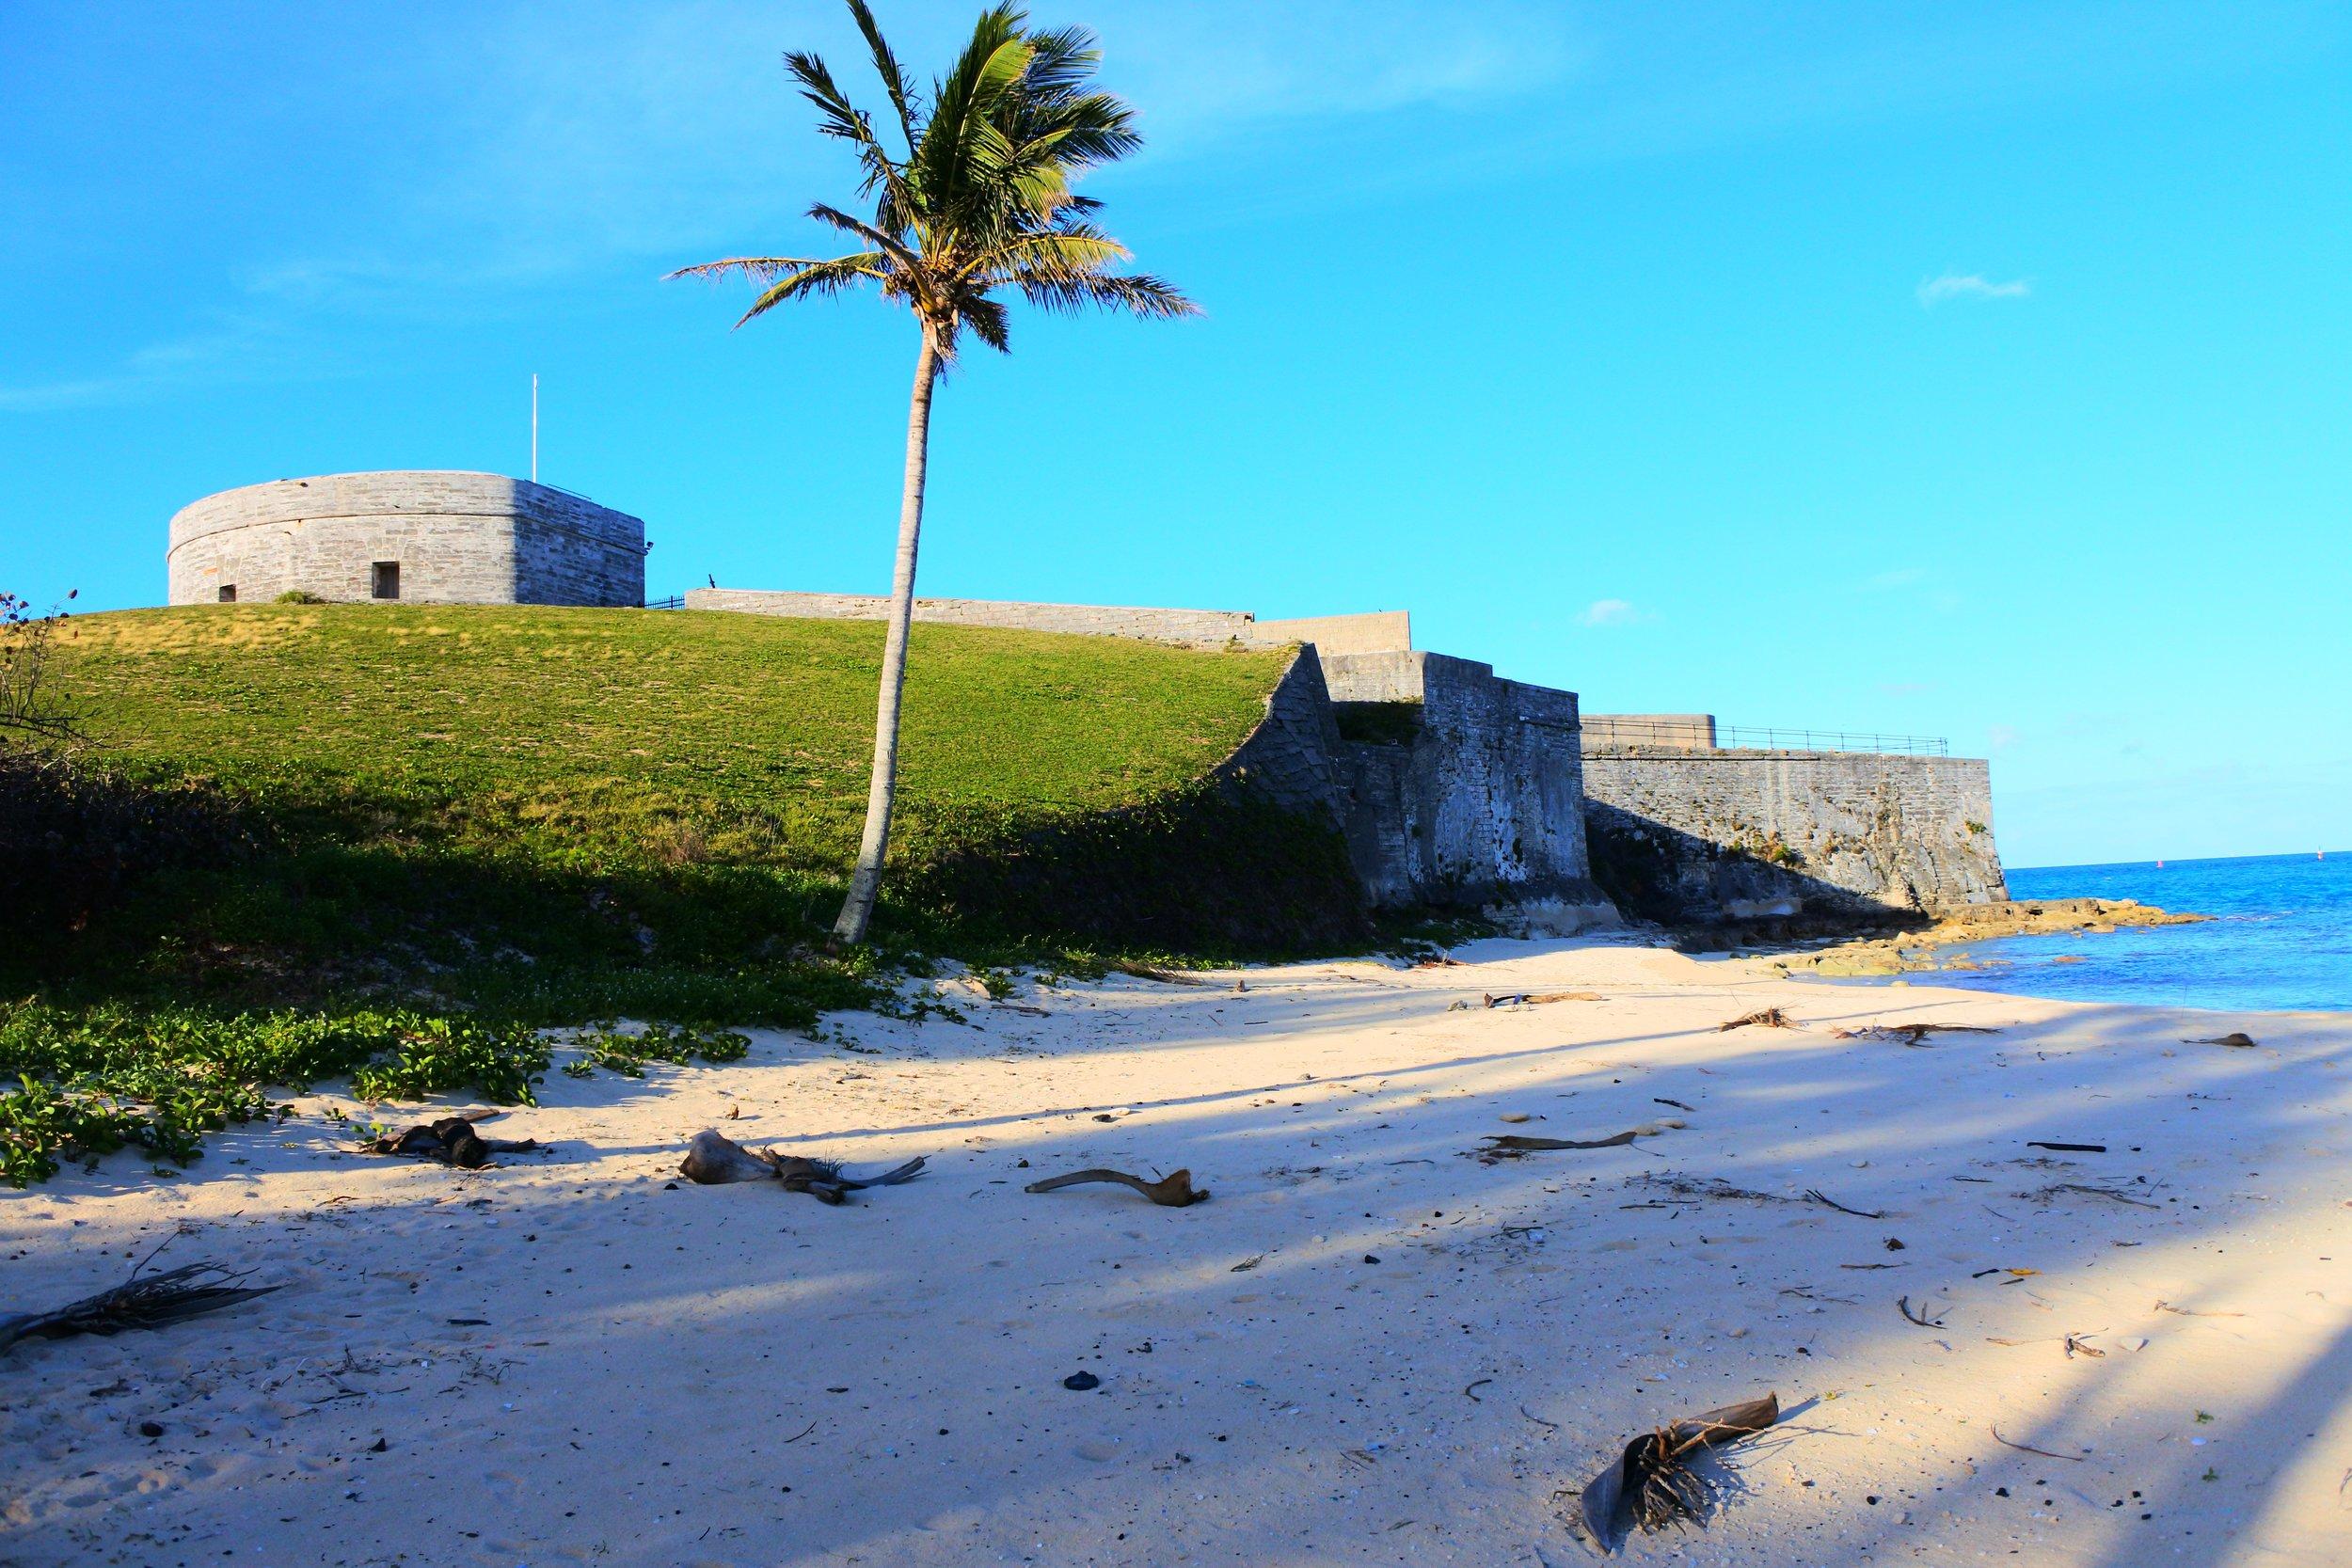 St. Catherine's Beach